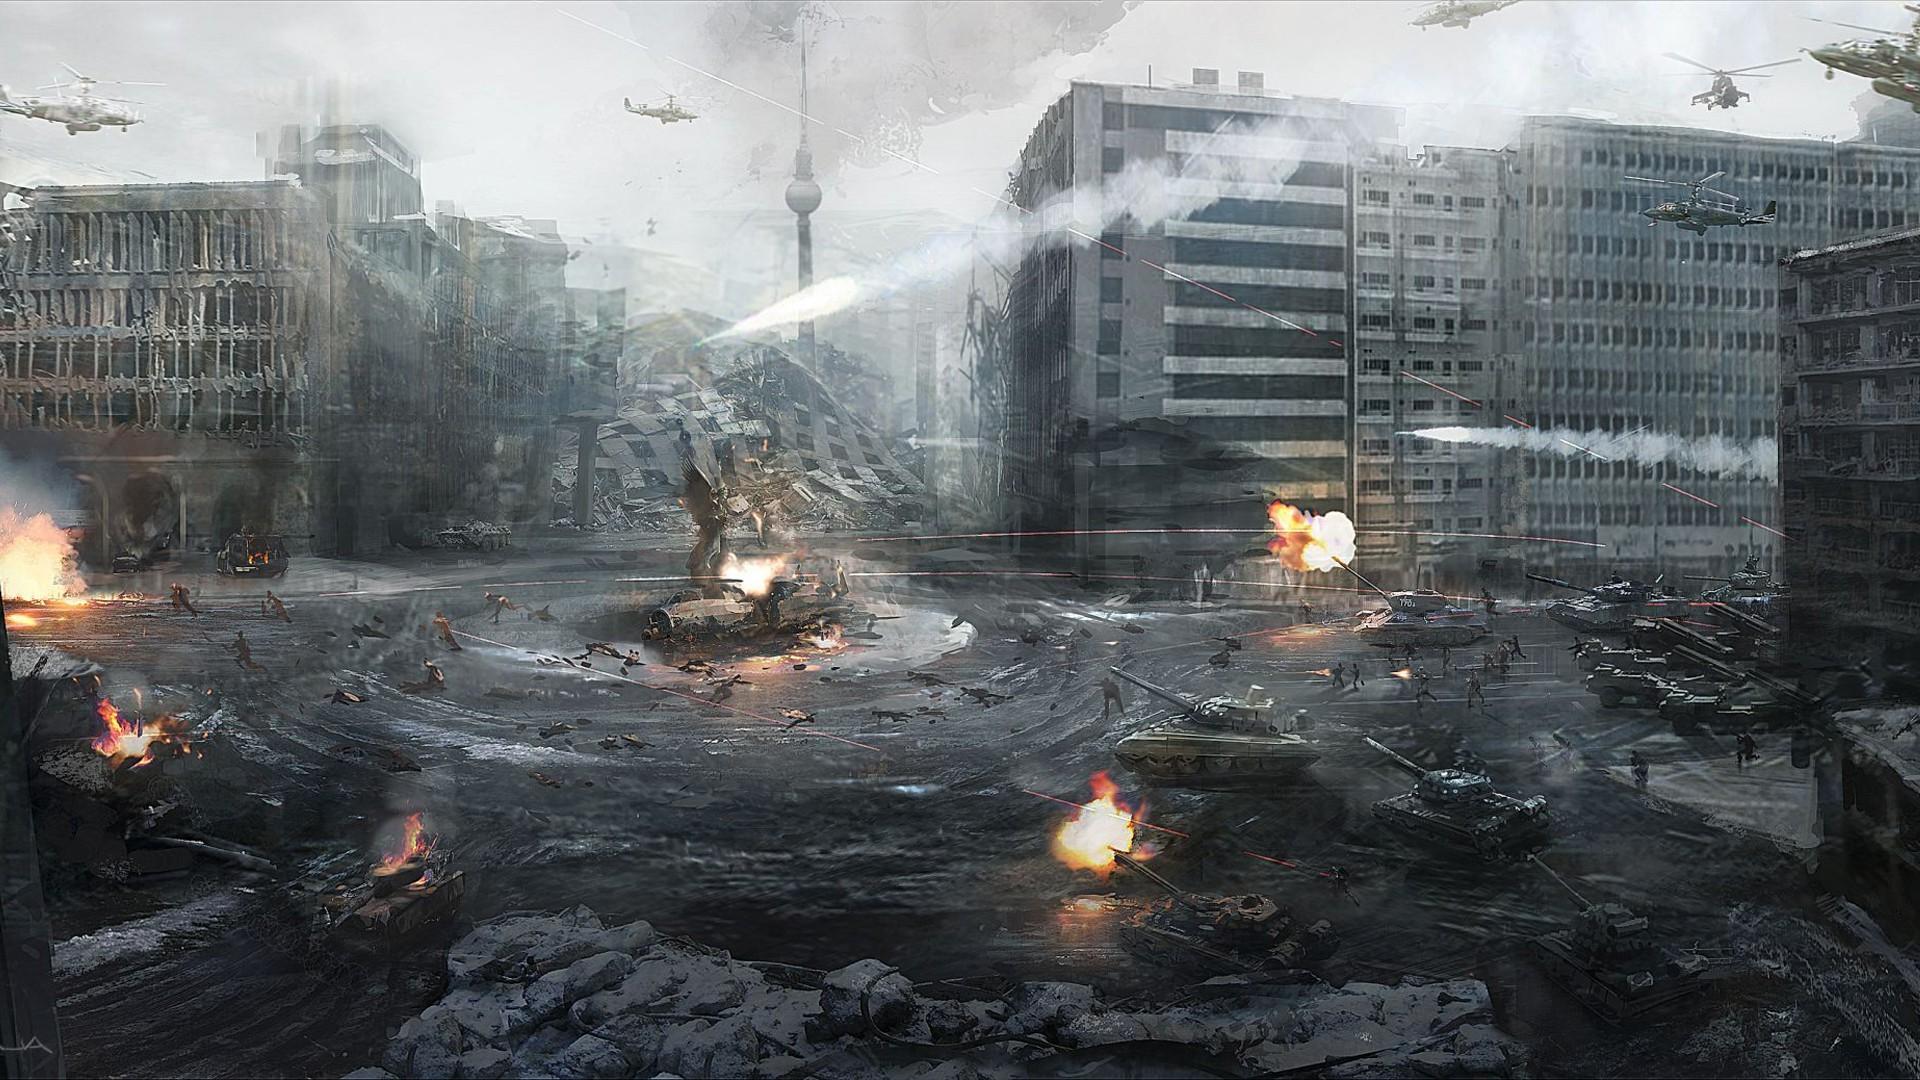 Wallpaper 1920x1080 Px Artwork Call Of Duty Modern Warfare 3